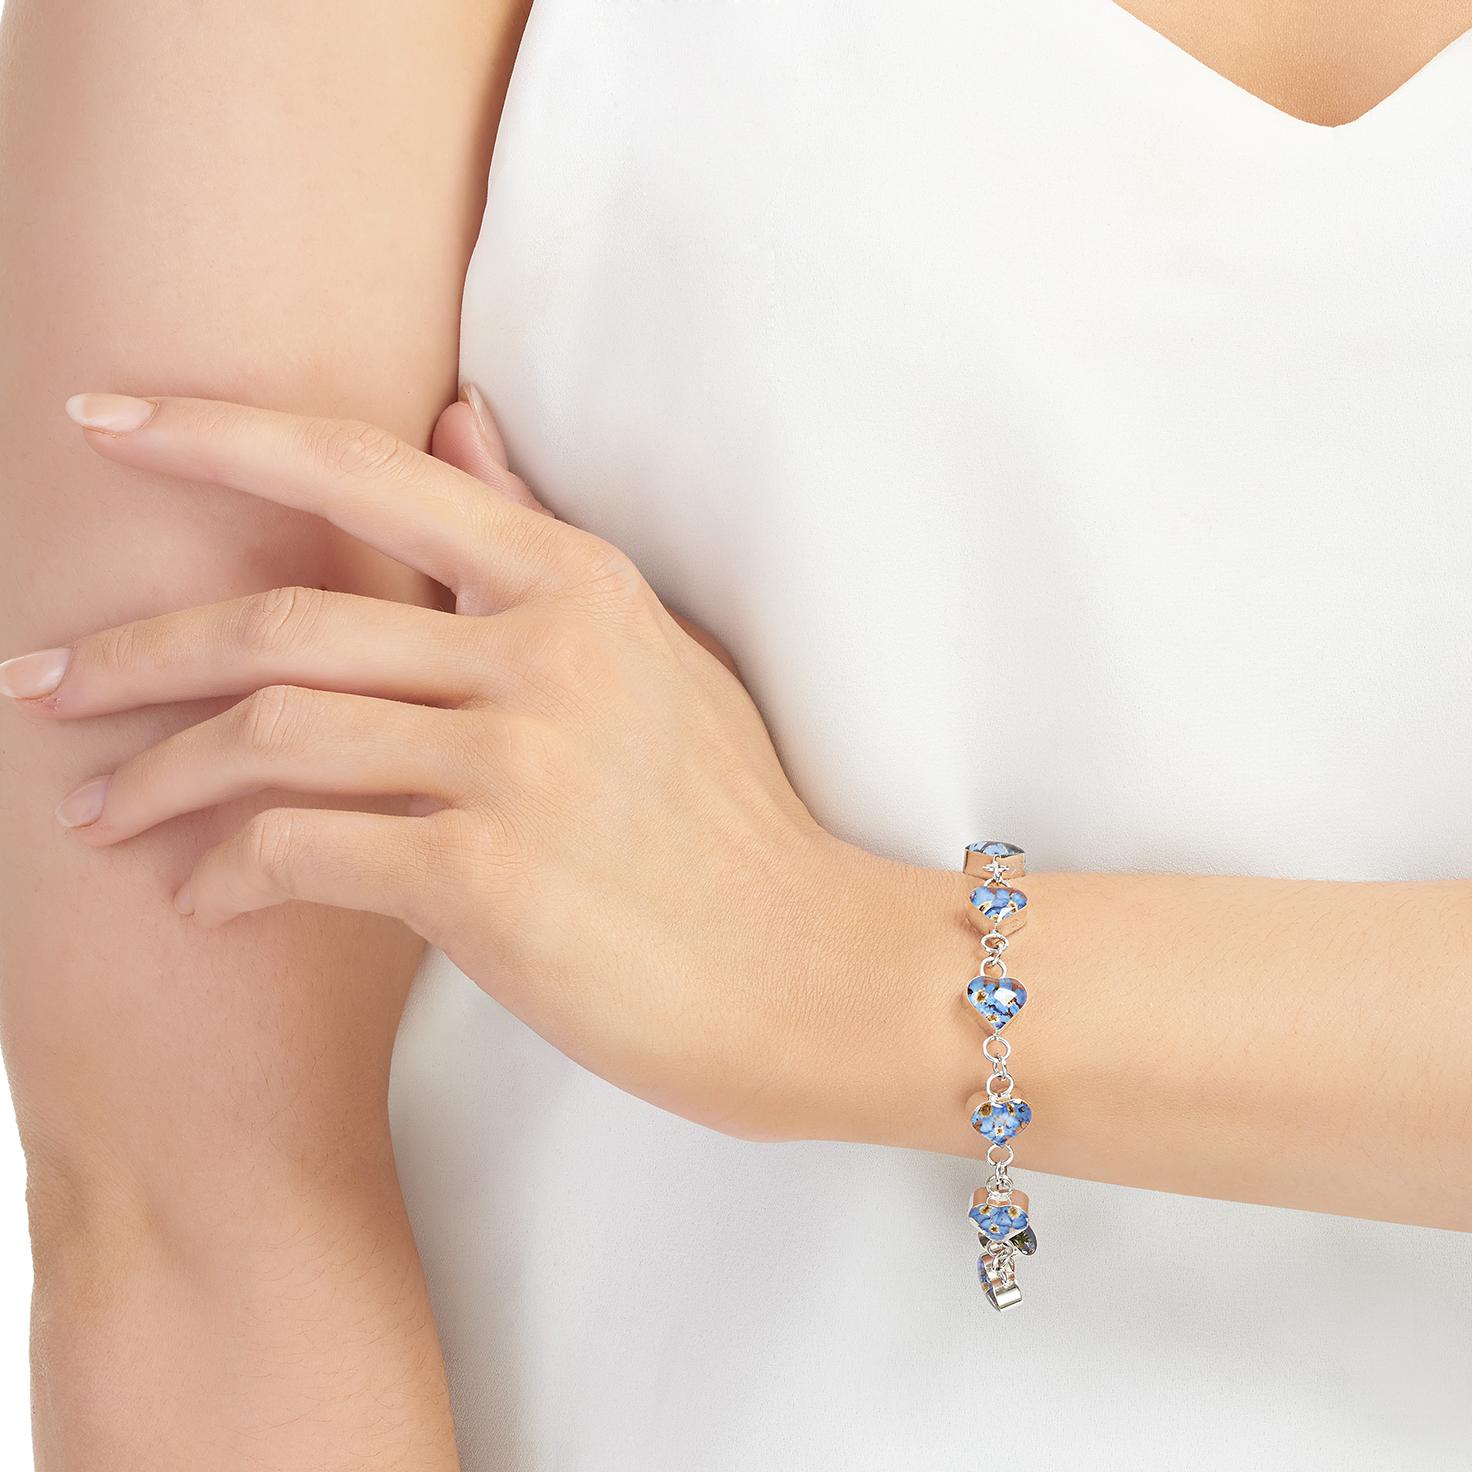 Shrieking Violet – Forget-me-not Silver Heart Charm Bracelet in Gift Box